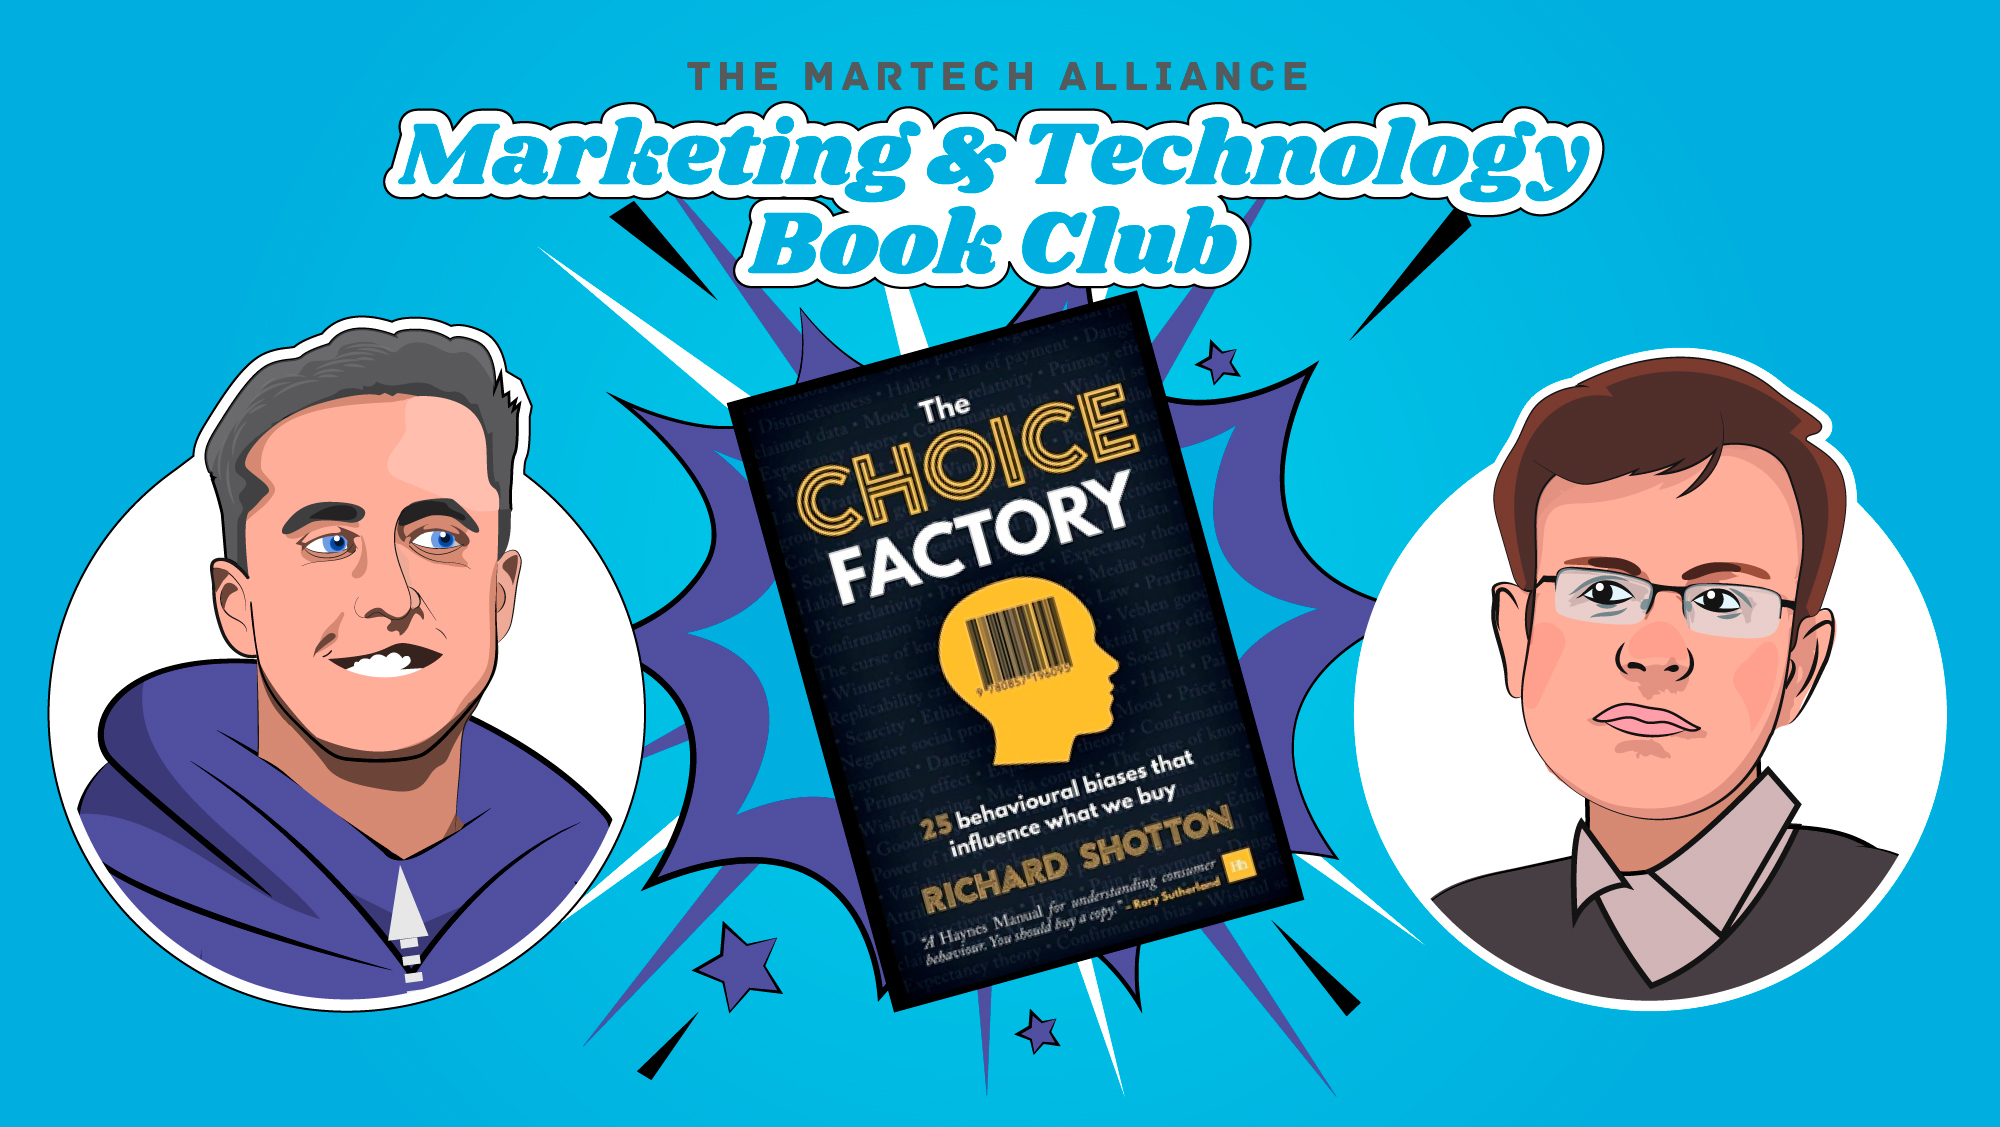 Marketing & Tech Book Club: The Choice Factory by Richard Shotton